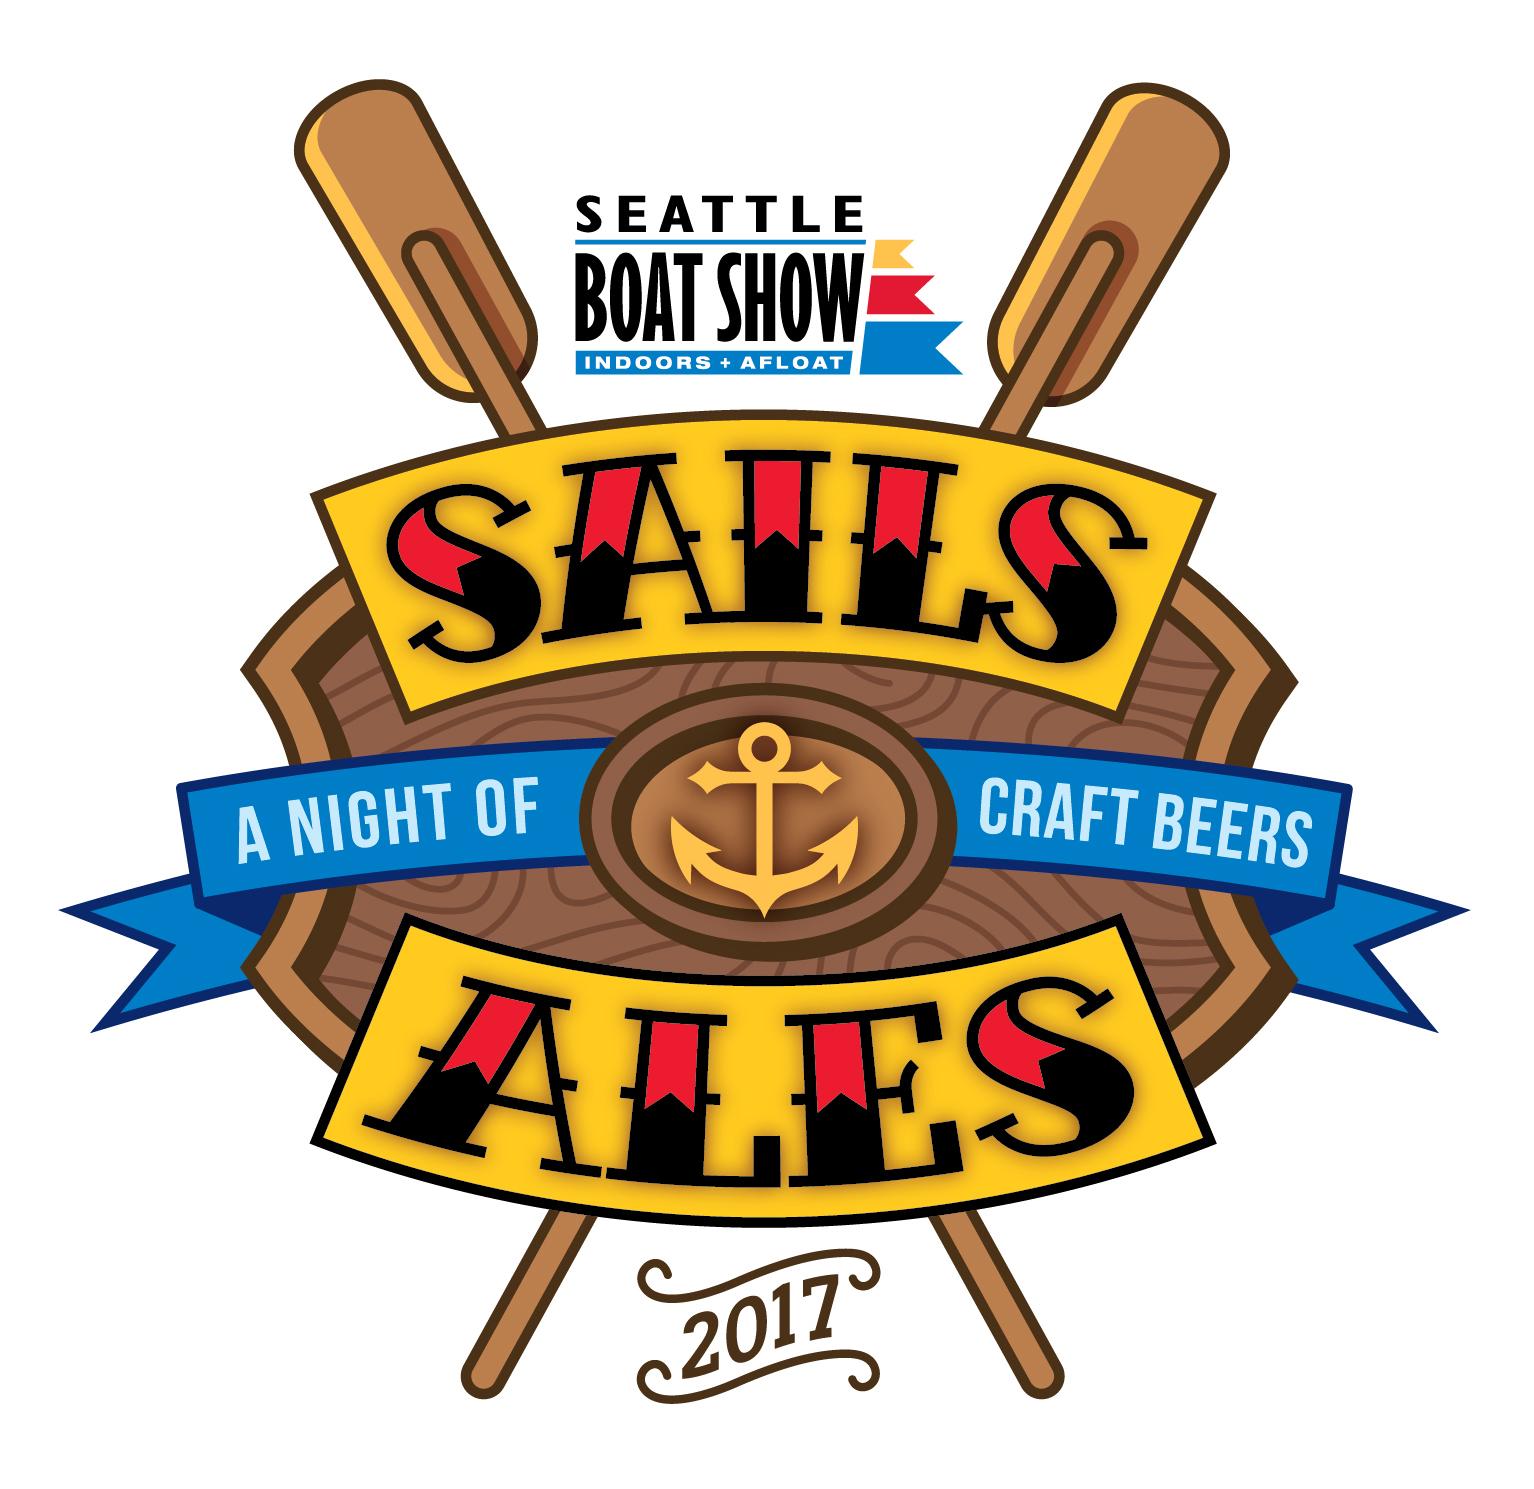 SeattleBoatShow.com.